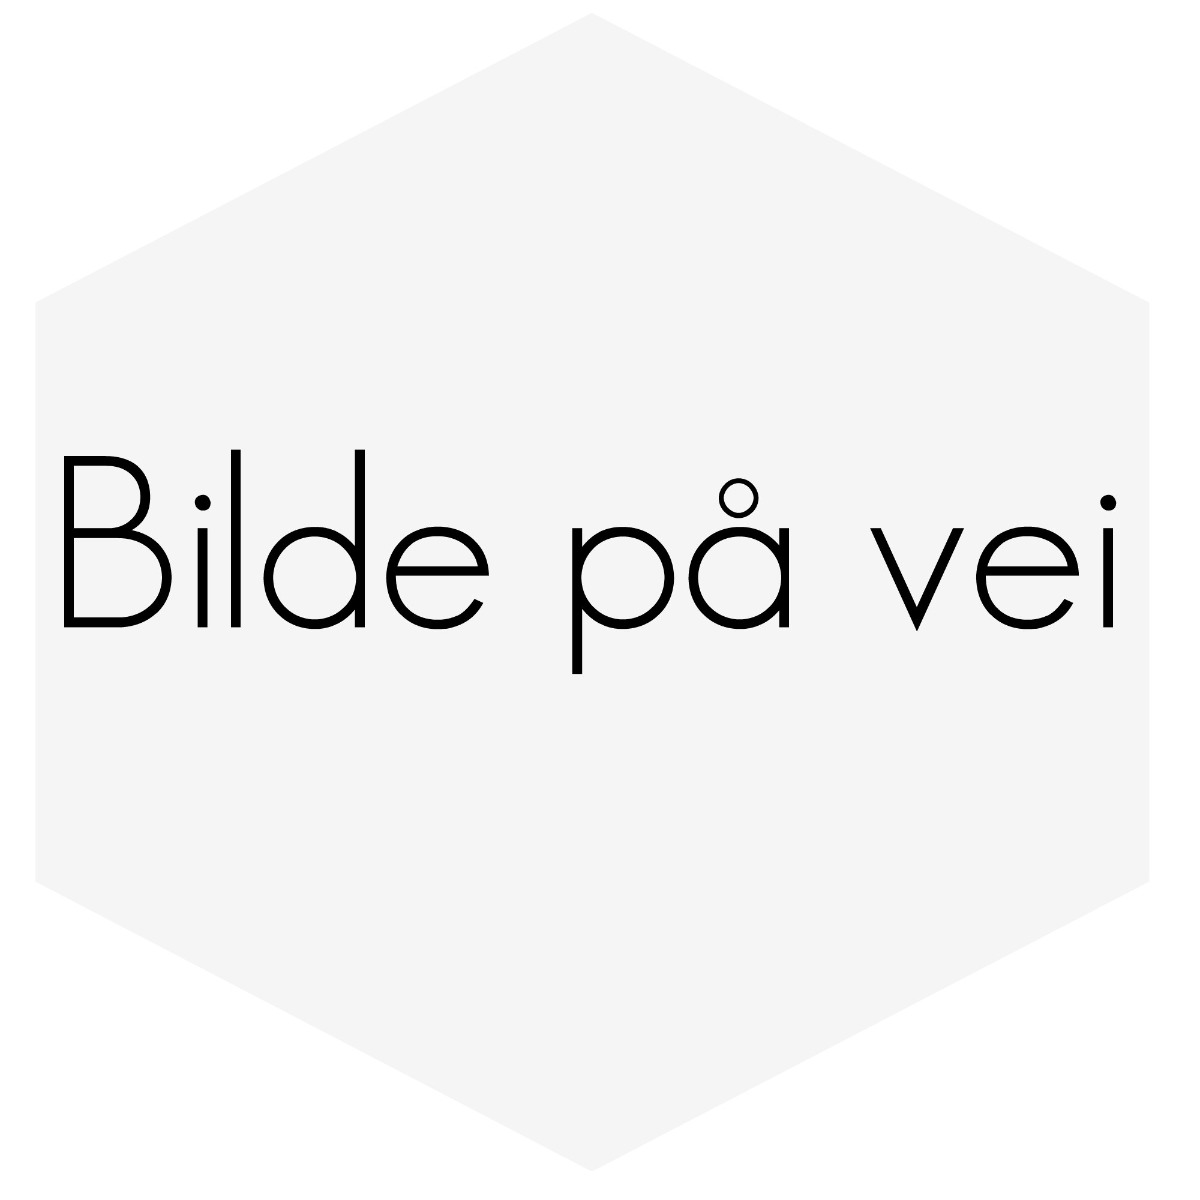 KJØRELYS VENSTRE FORAN TIL VOLVO XC60 2008-13 v/grillen